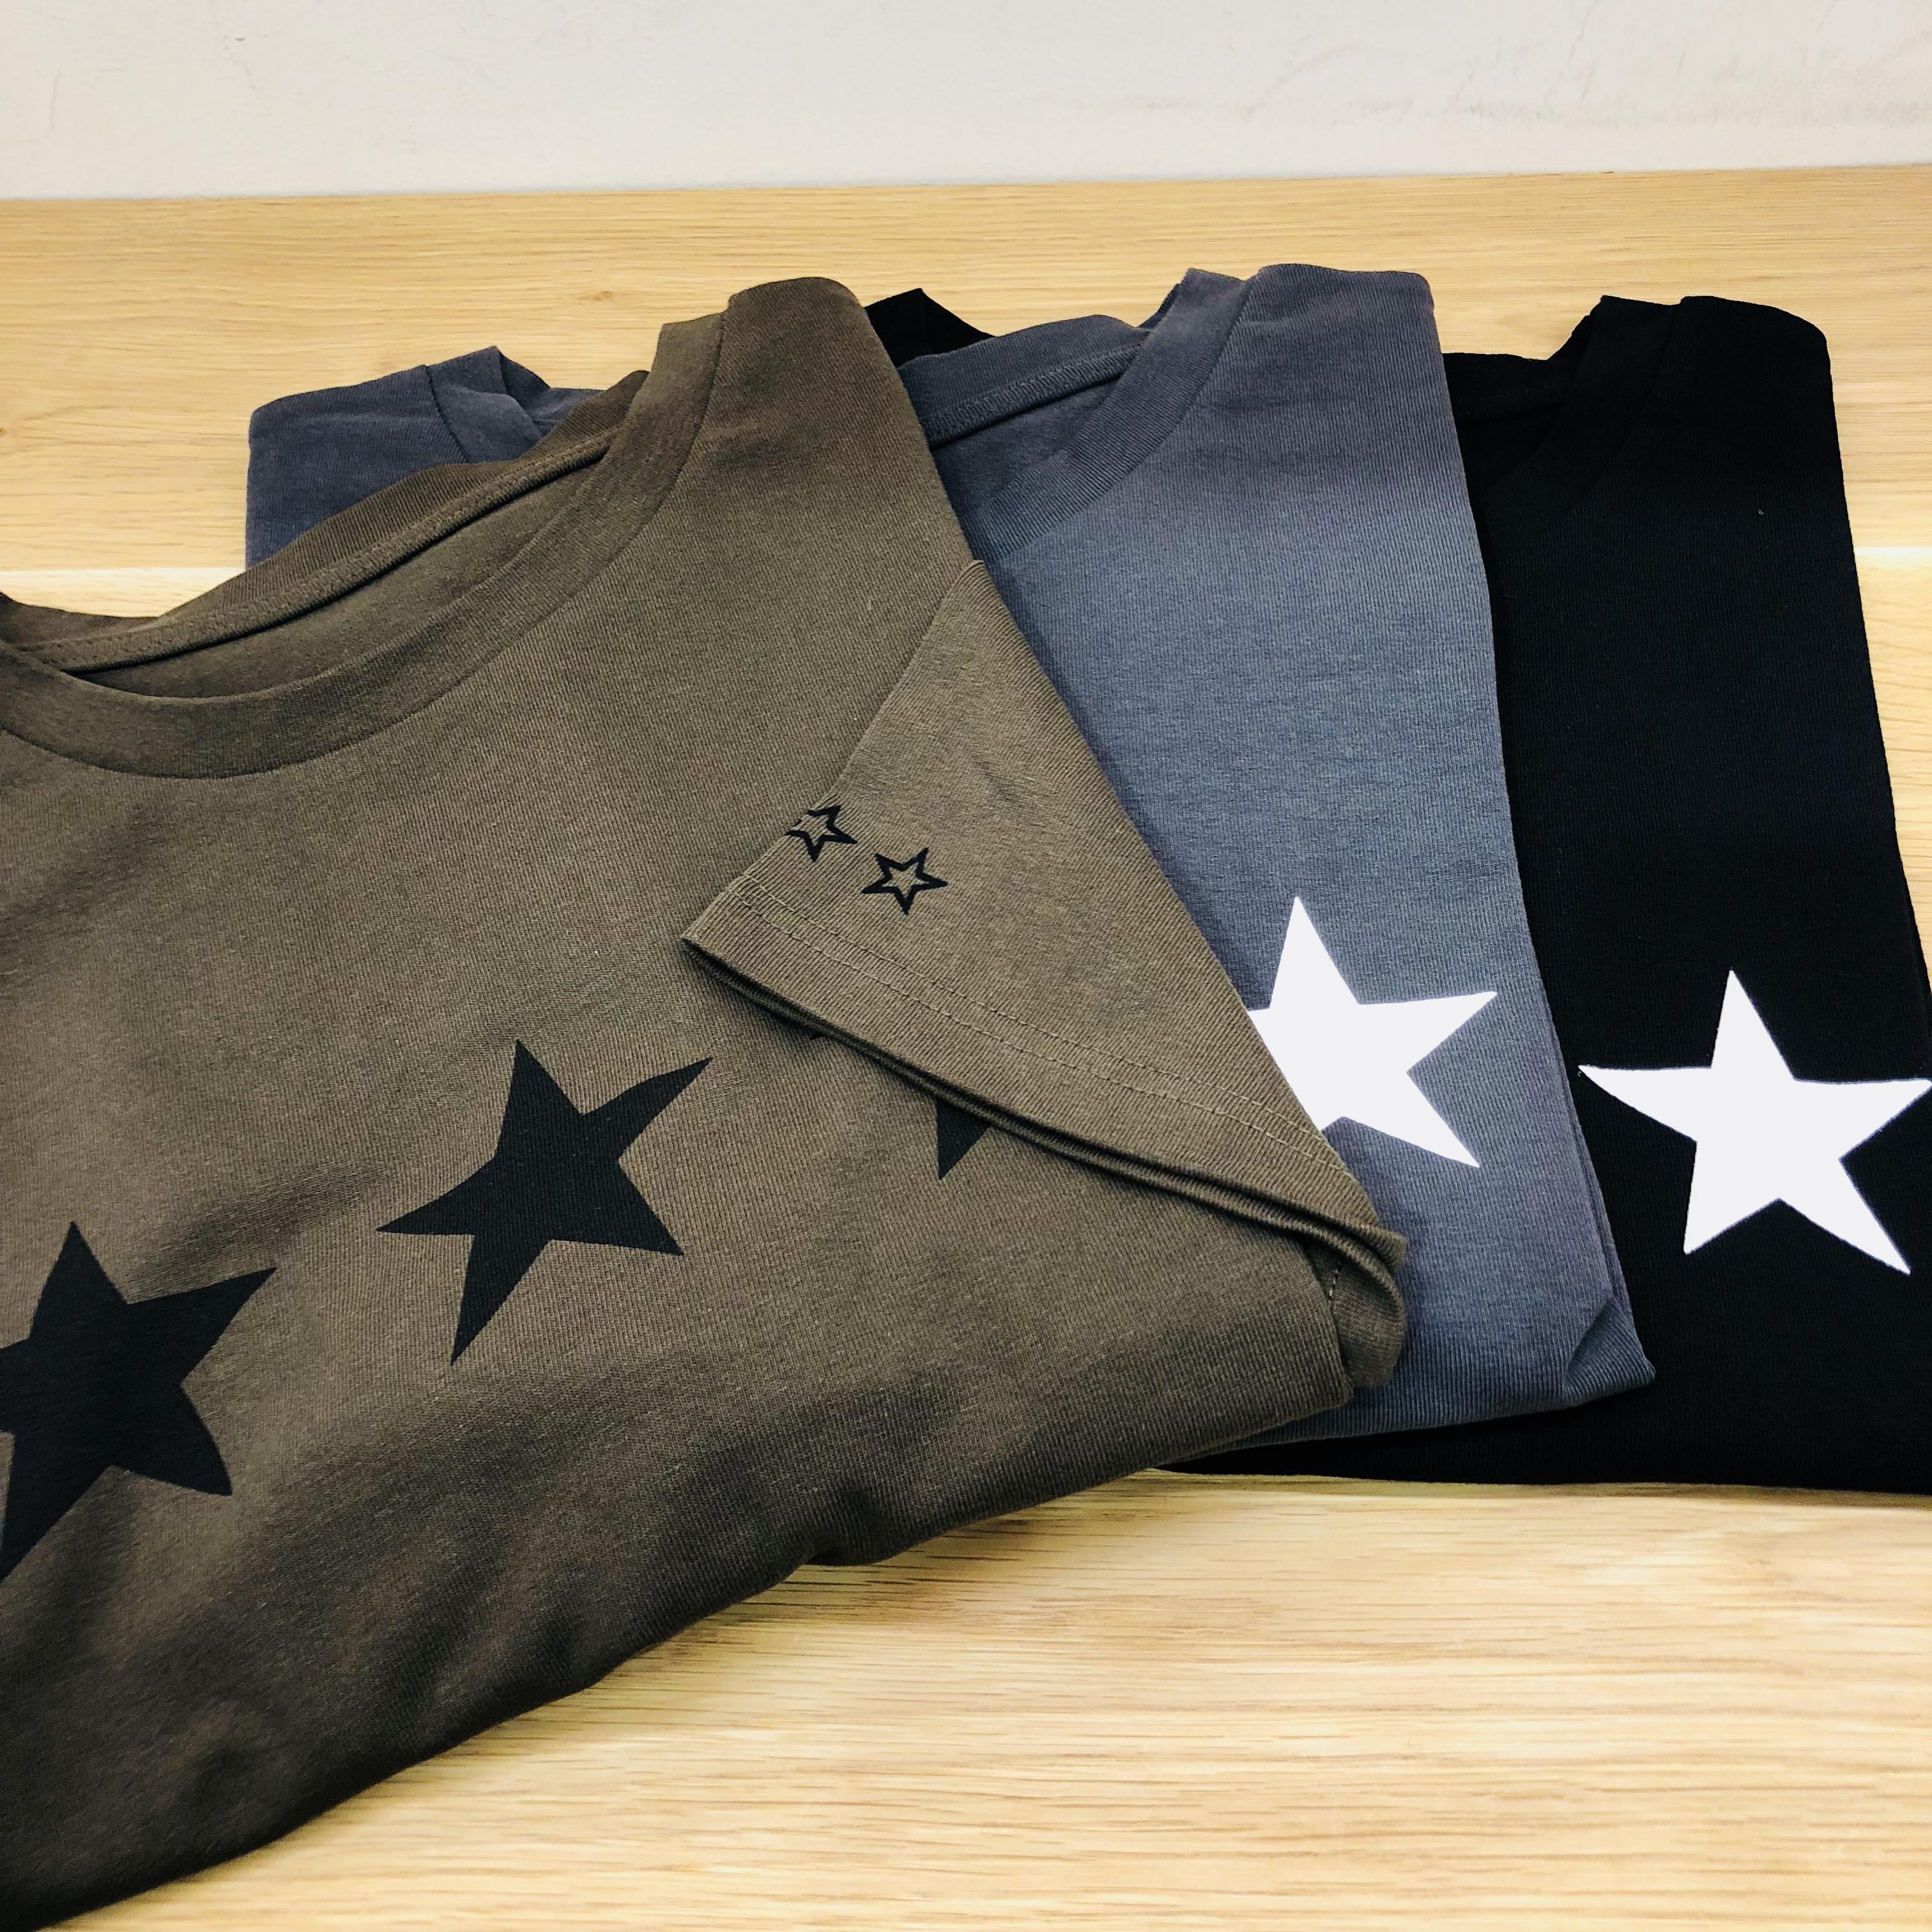 Scrap Book スクラップブック STAR T-shirt スターTシャツ